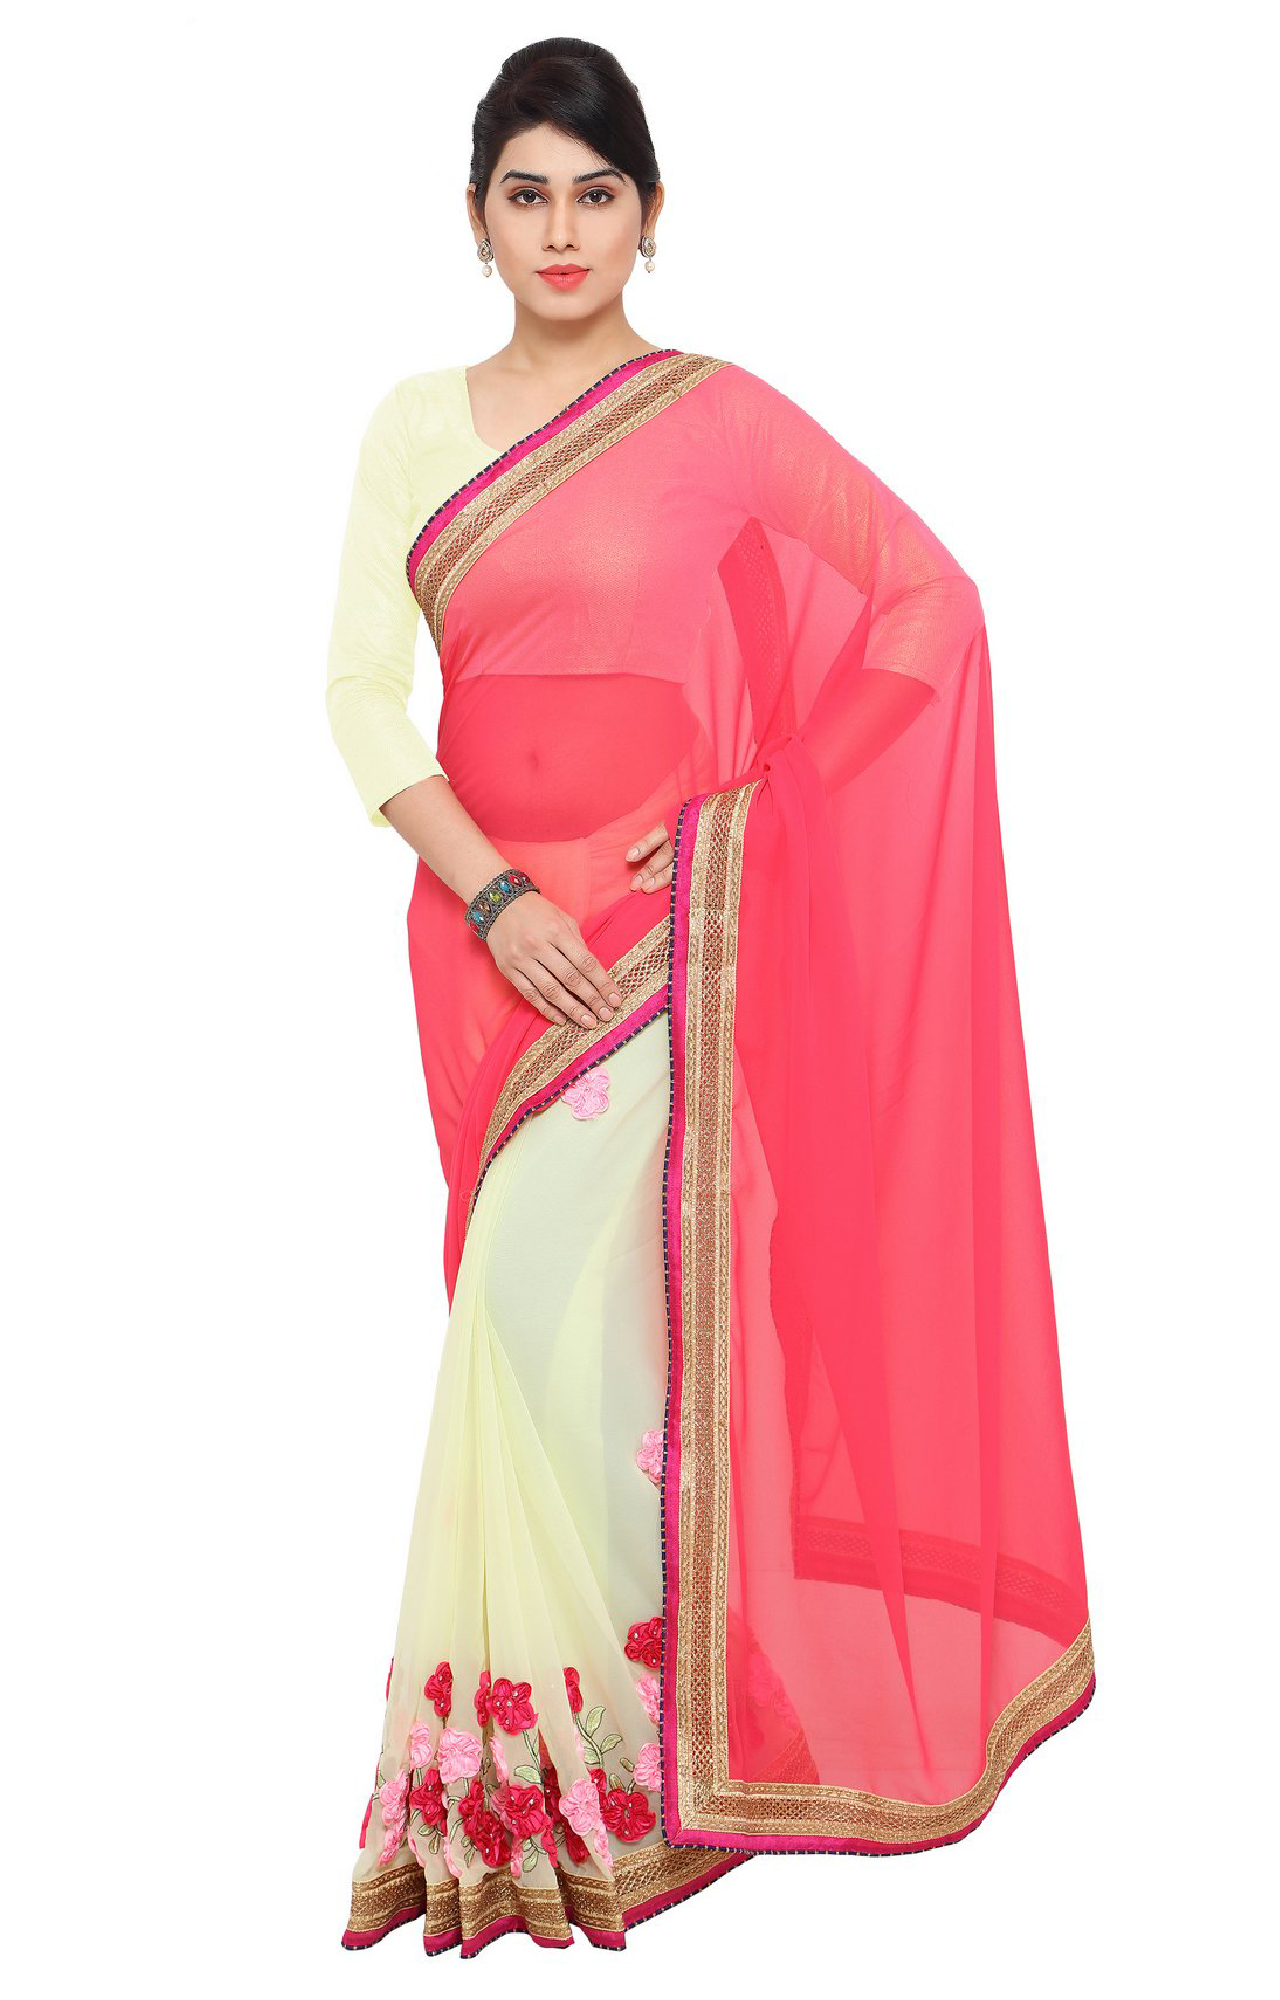 SATIMA | Pink and White Georgette Embroiderd Saree